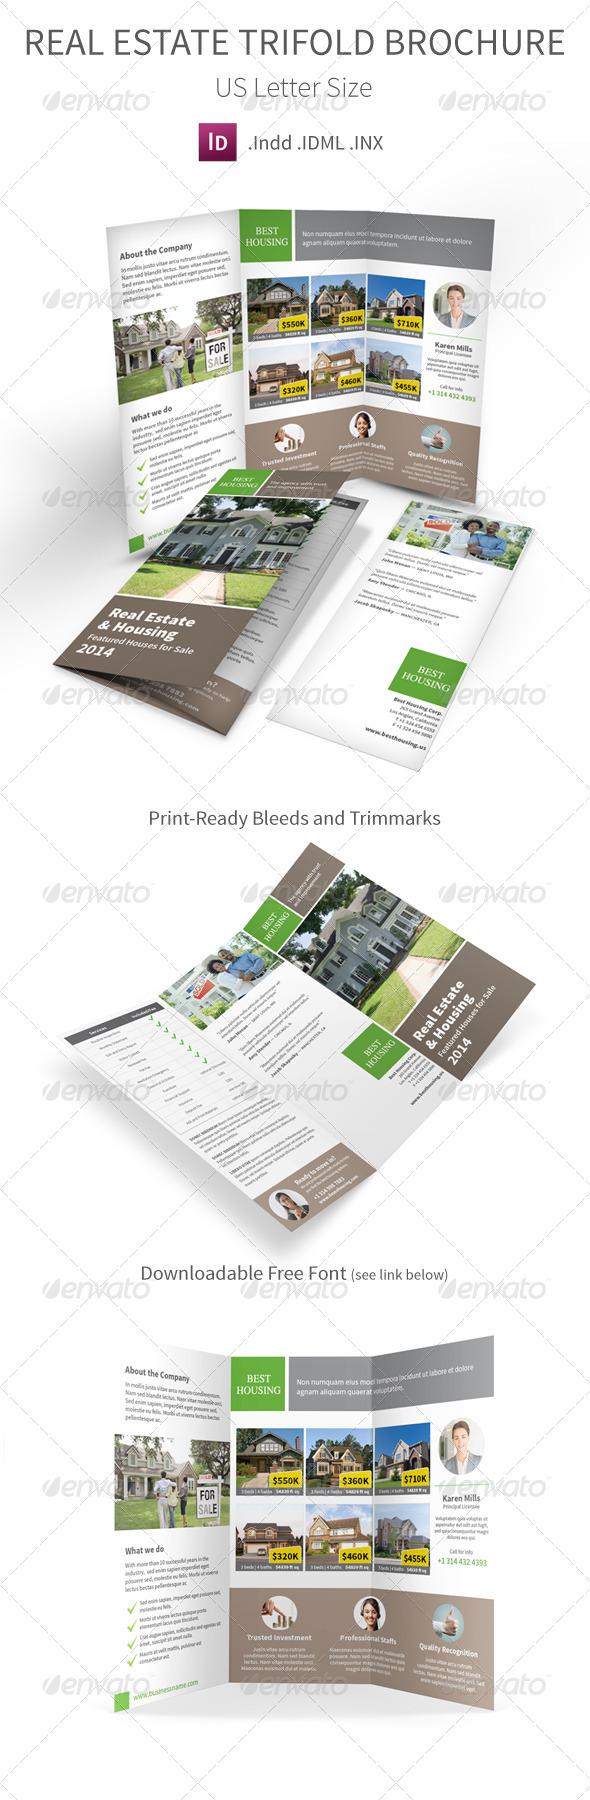 GraphicRiver Real Estate Trifold Brochure 7547645